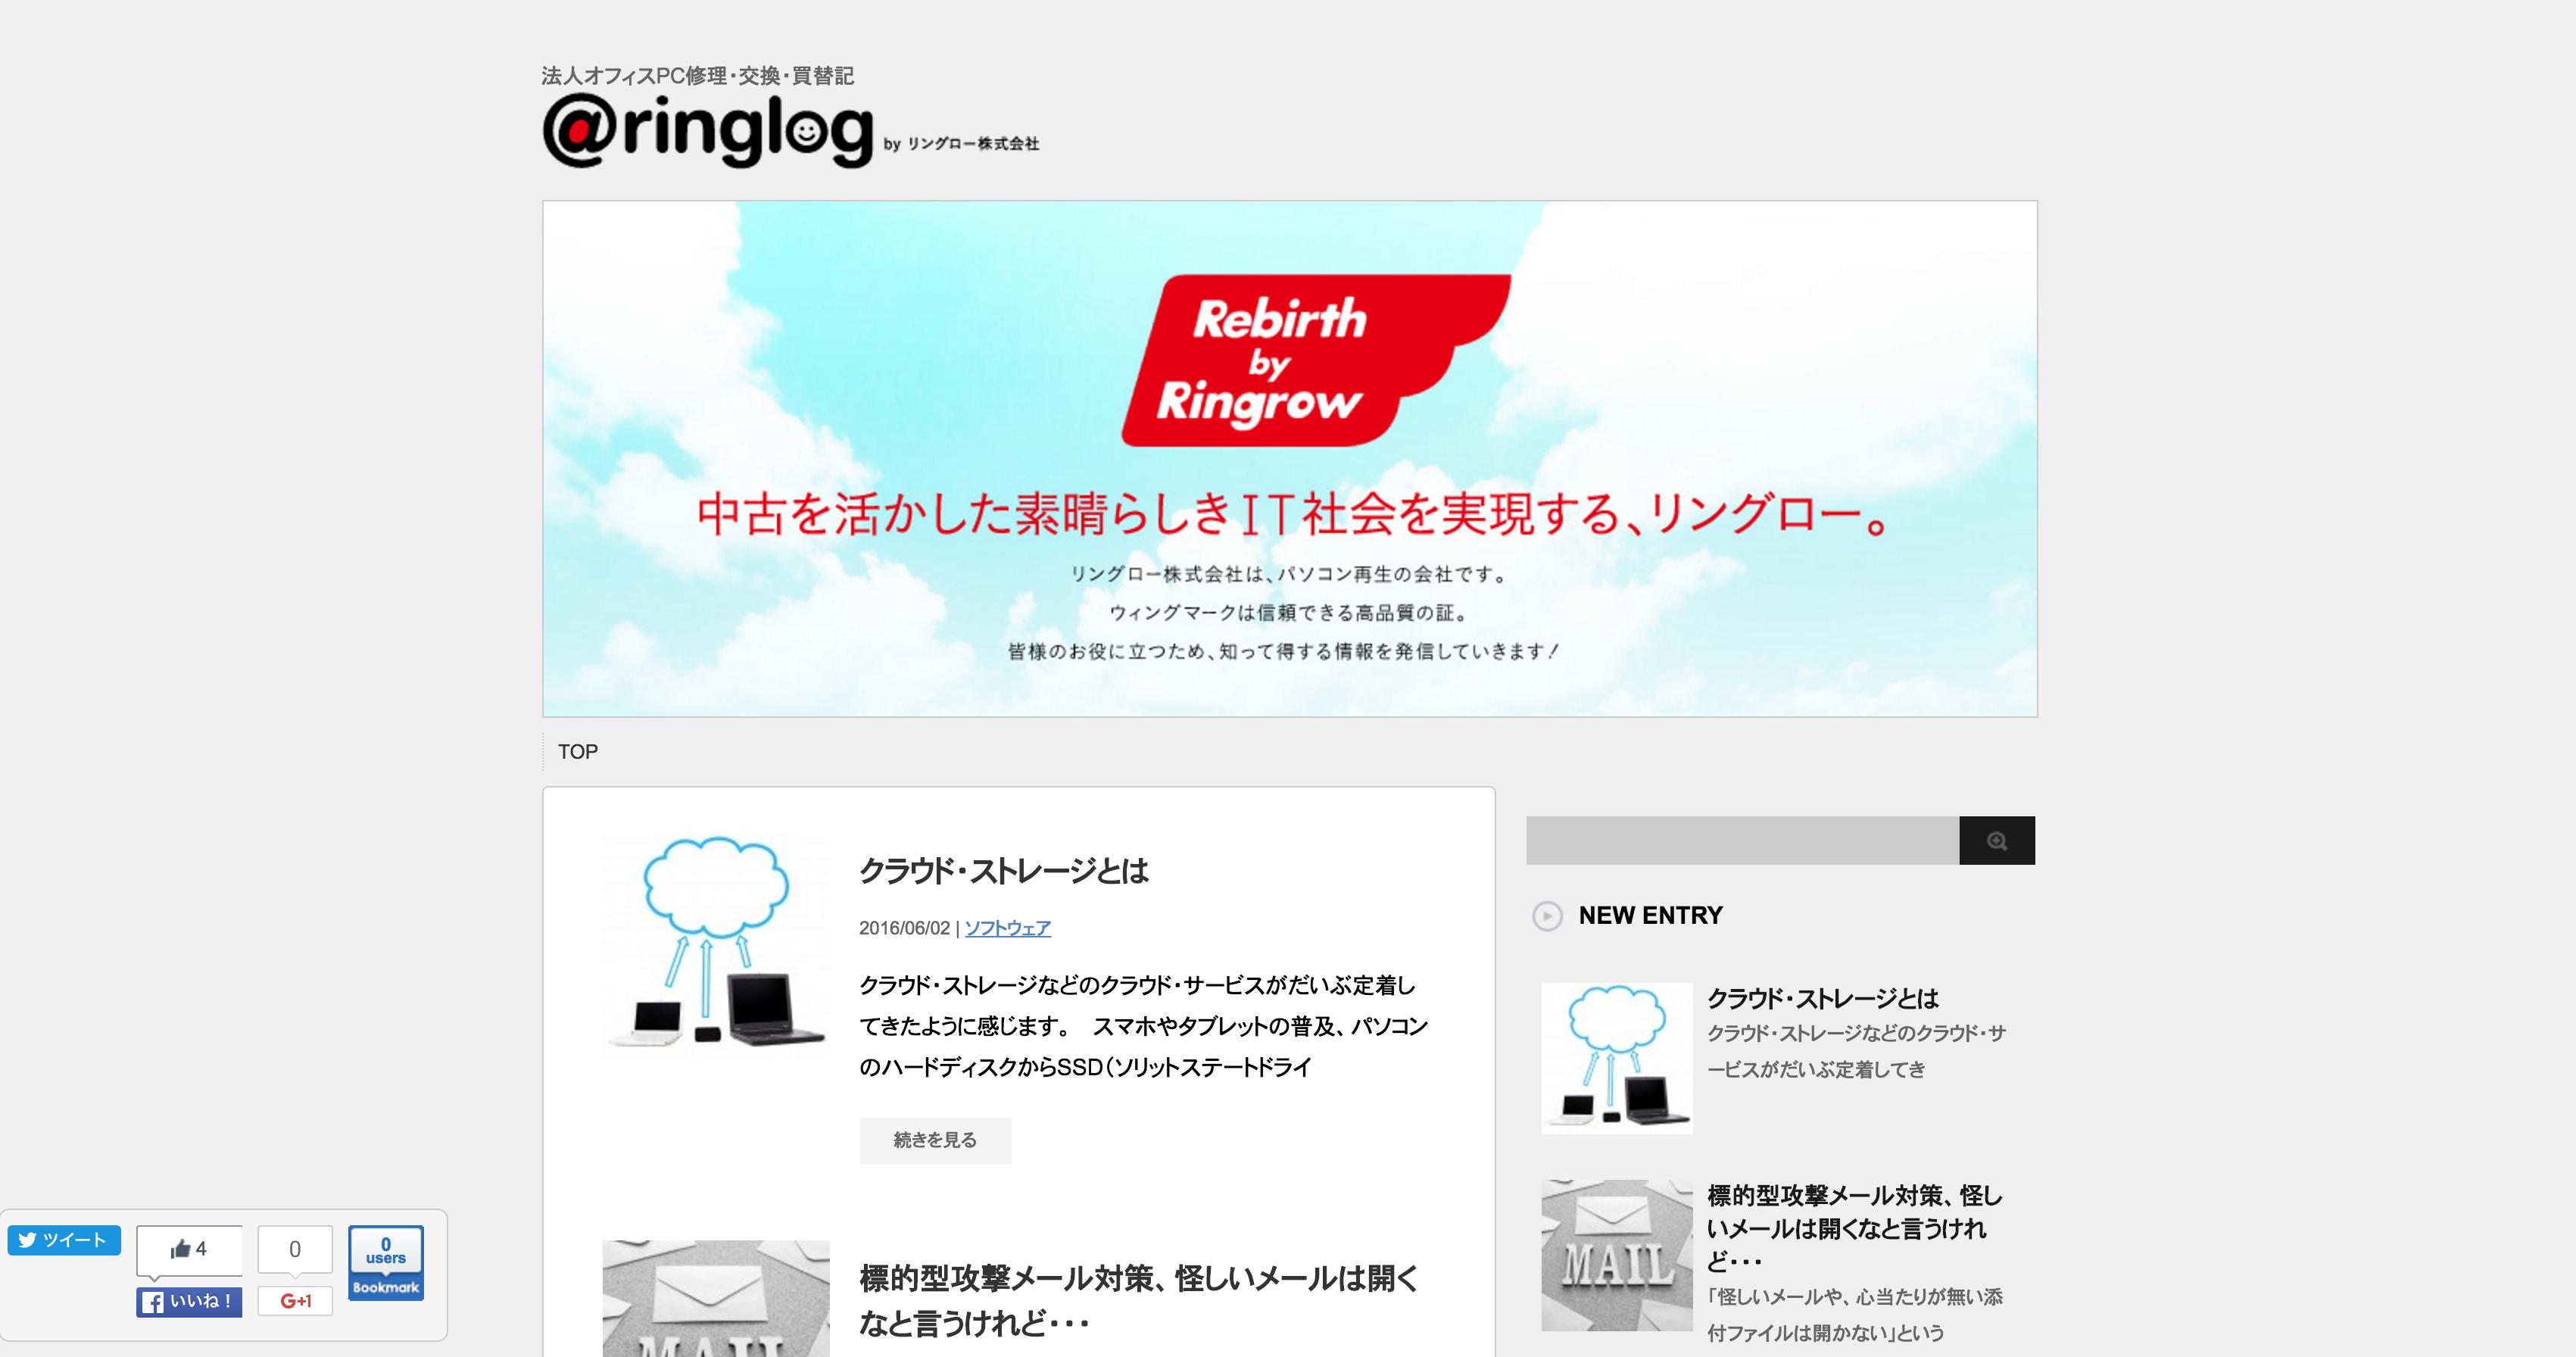 @ringlog